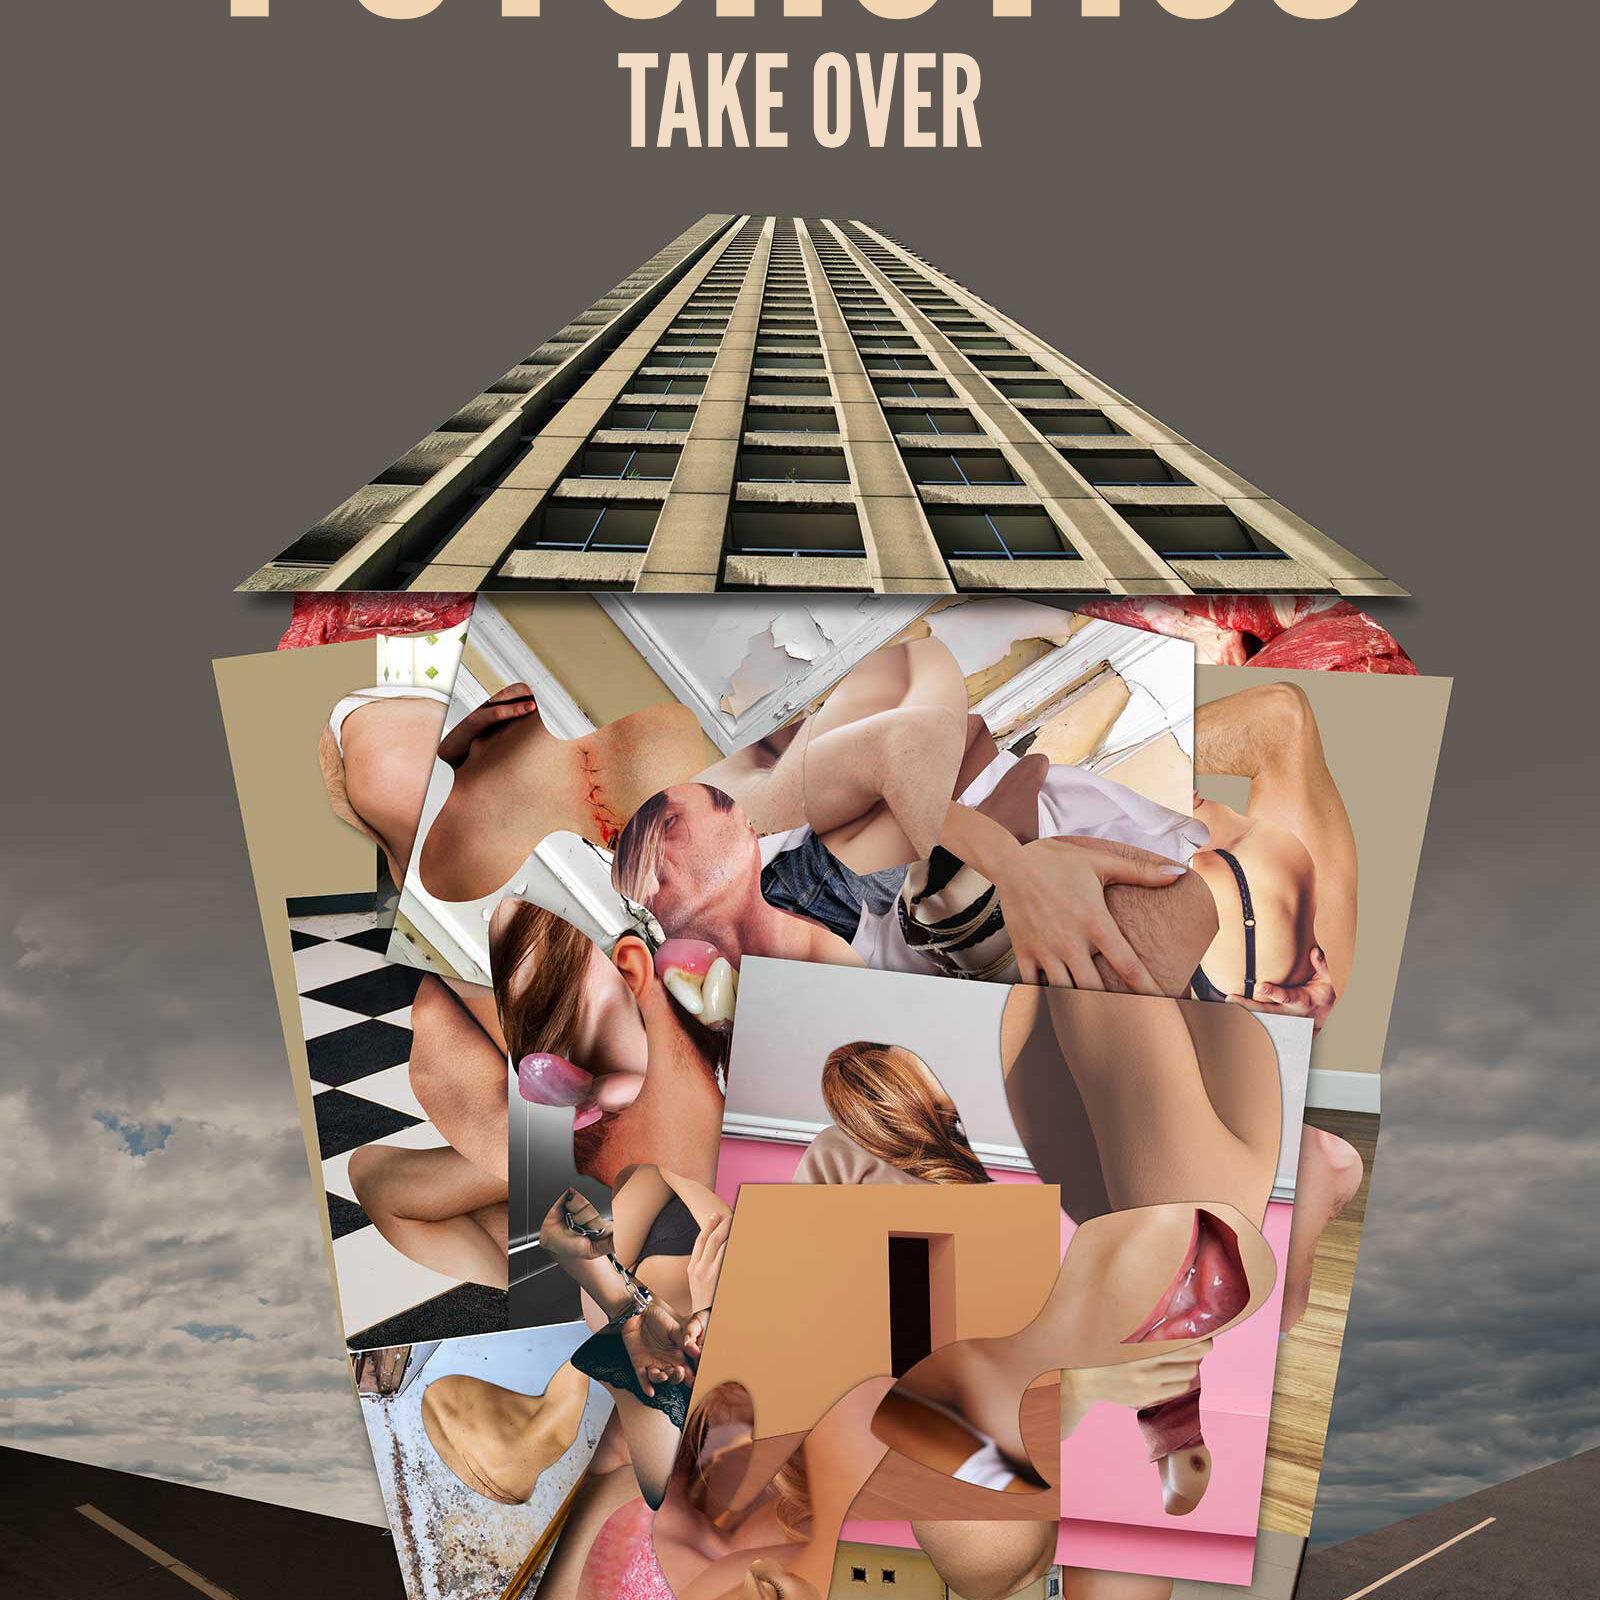 Let The Psychotics Take Over - JG Ballard's High Rise